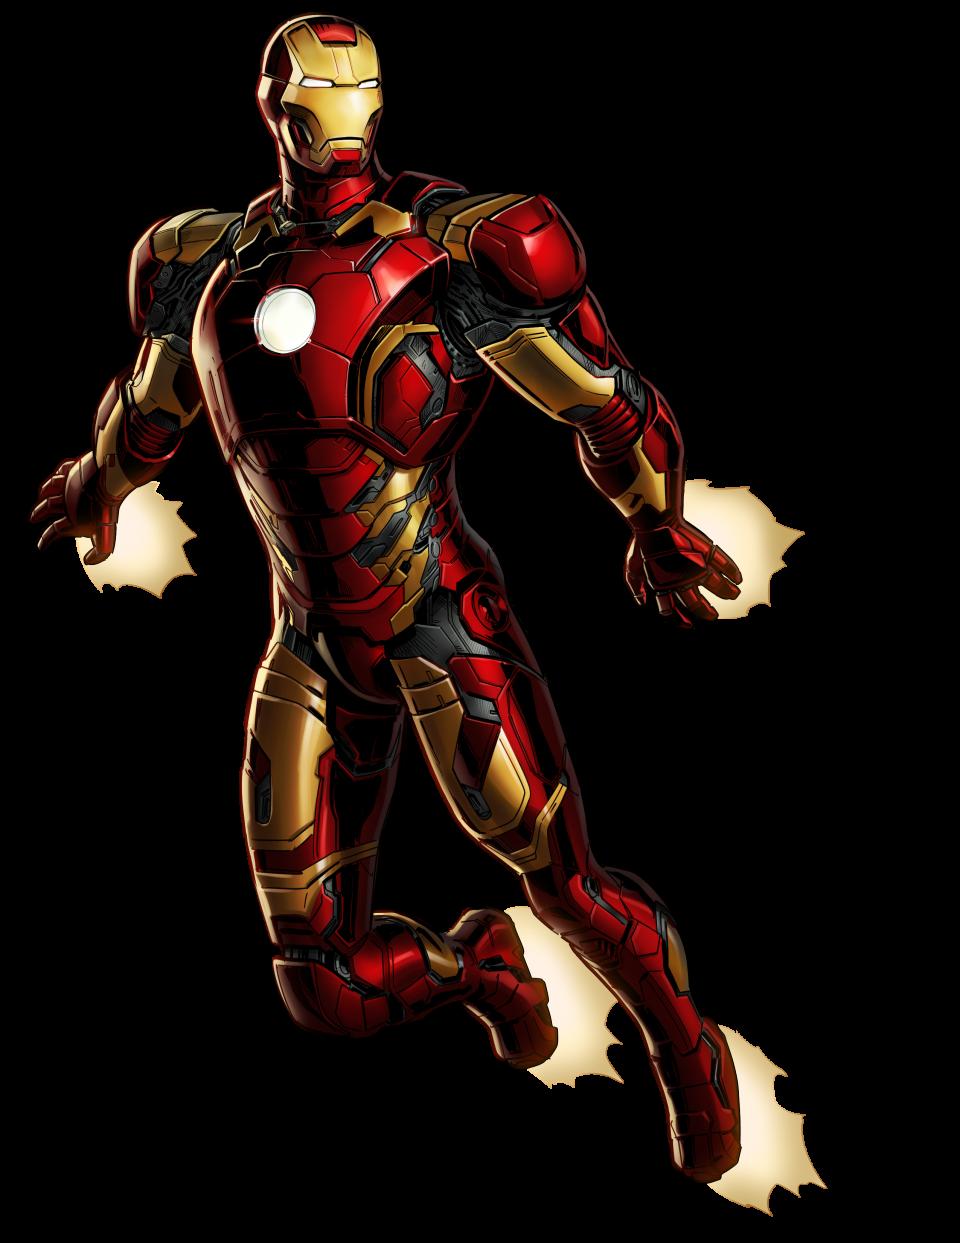 Ironman Avengers PNG Image - PurePNG   Free transparent ...